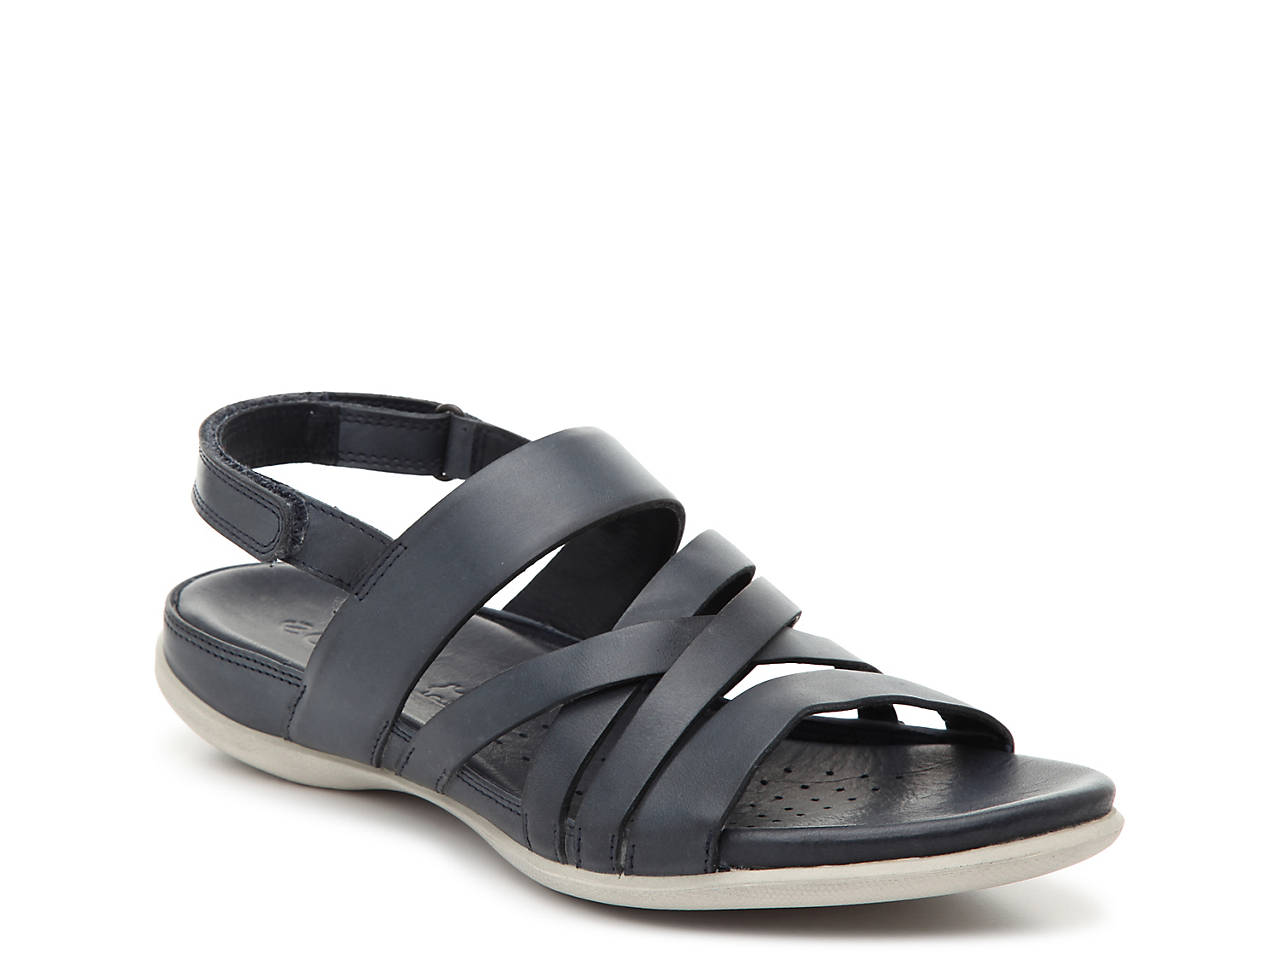 792b5986 Flash Sandal